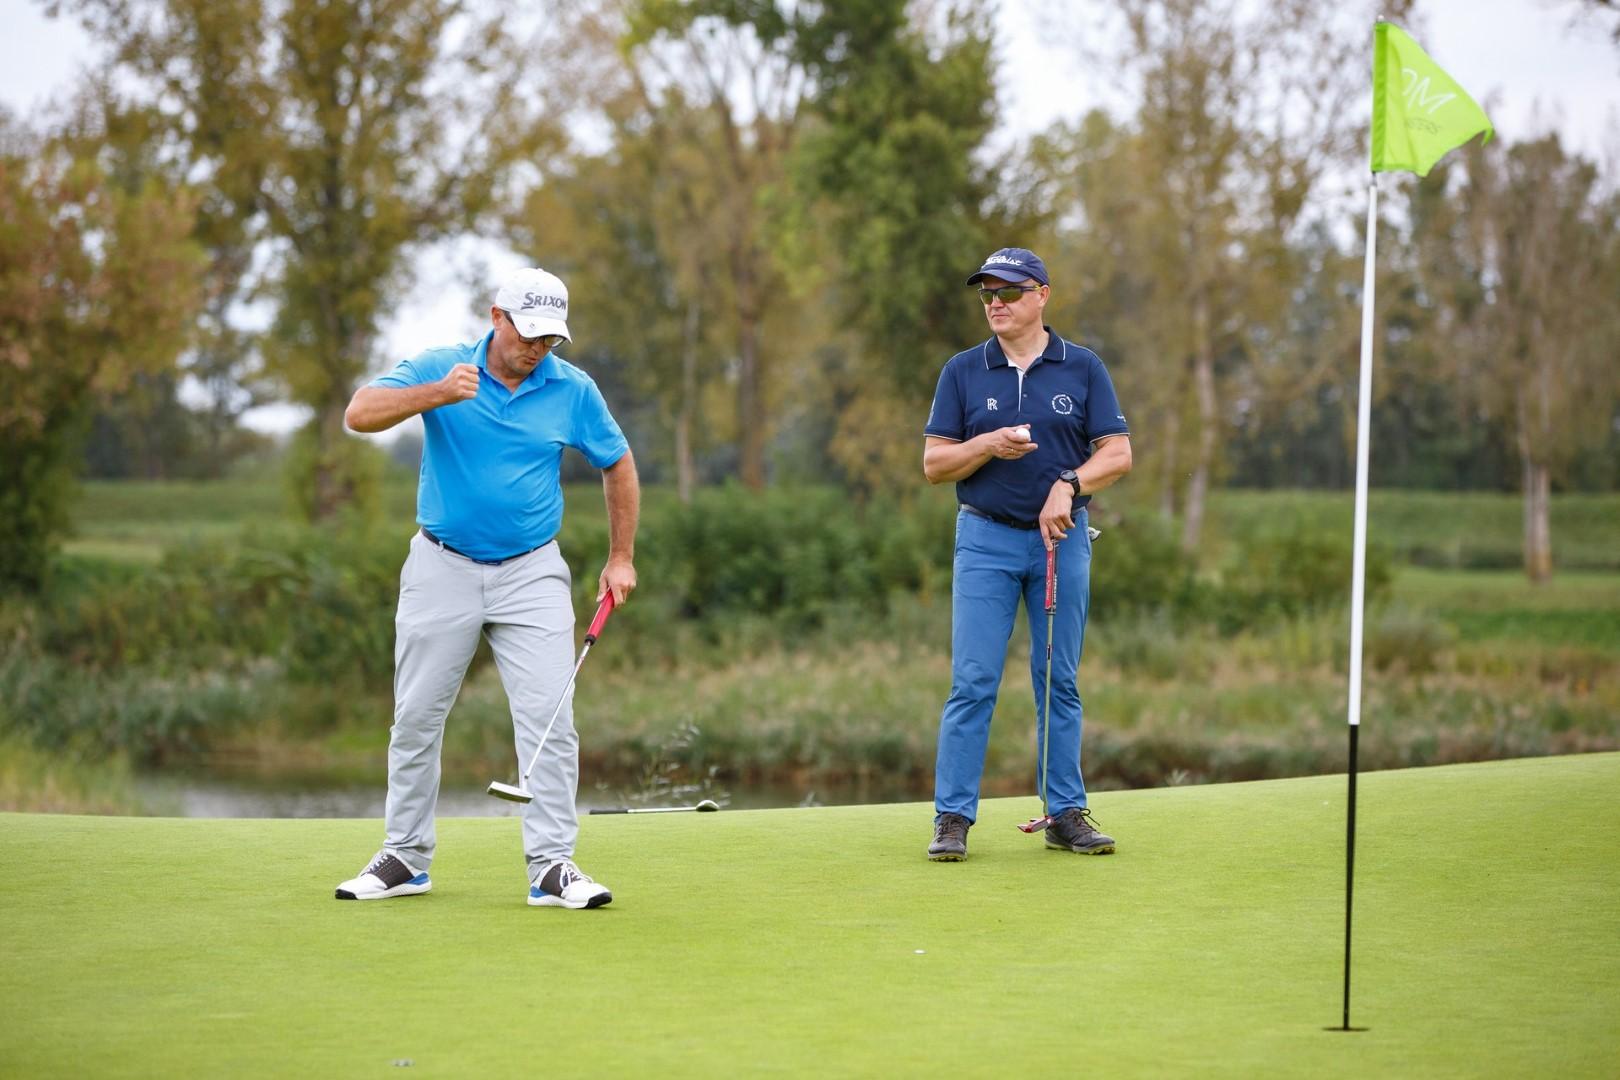 Final Polish Masters 2020 golfguru